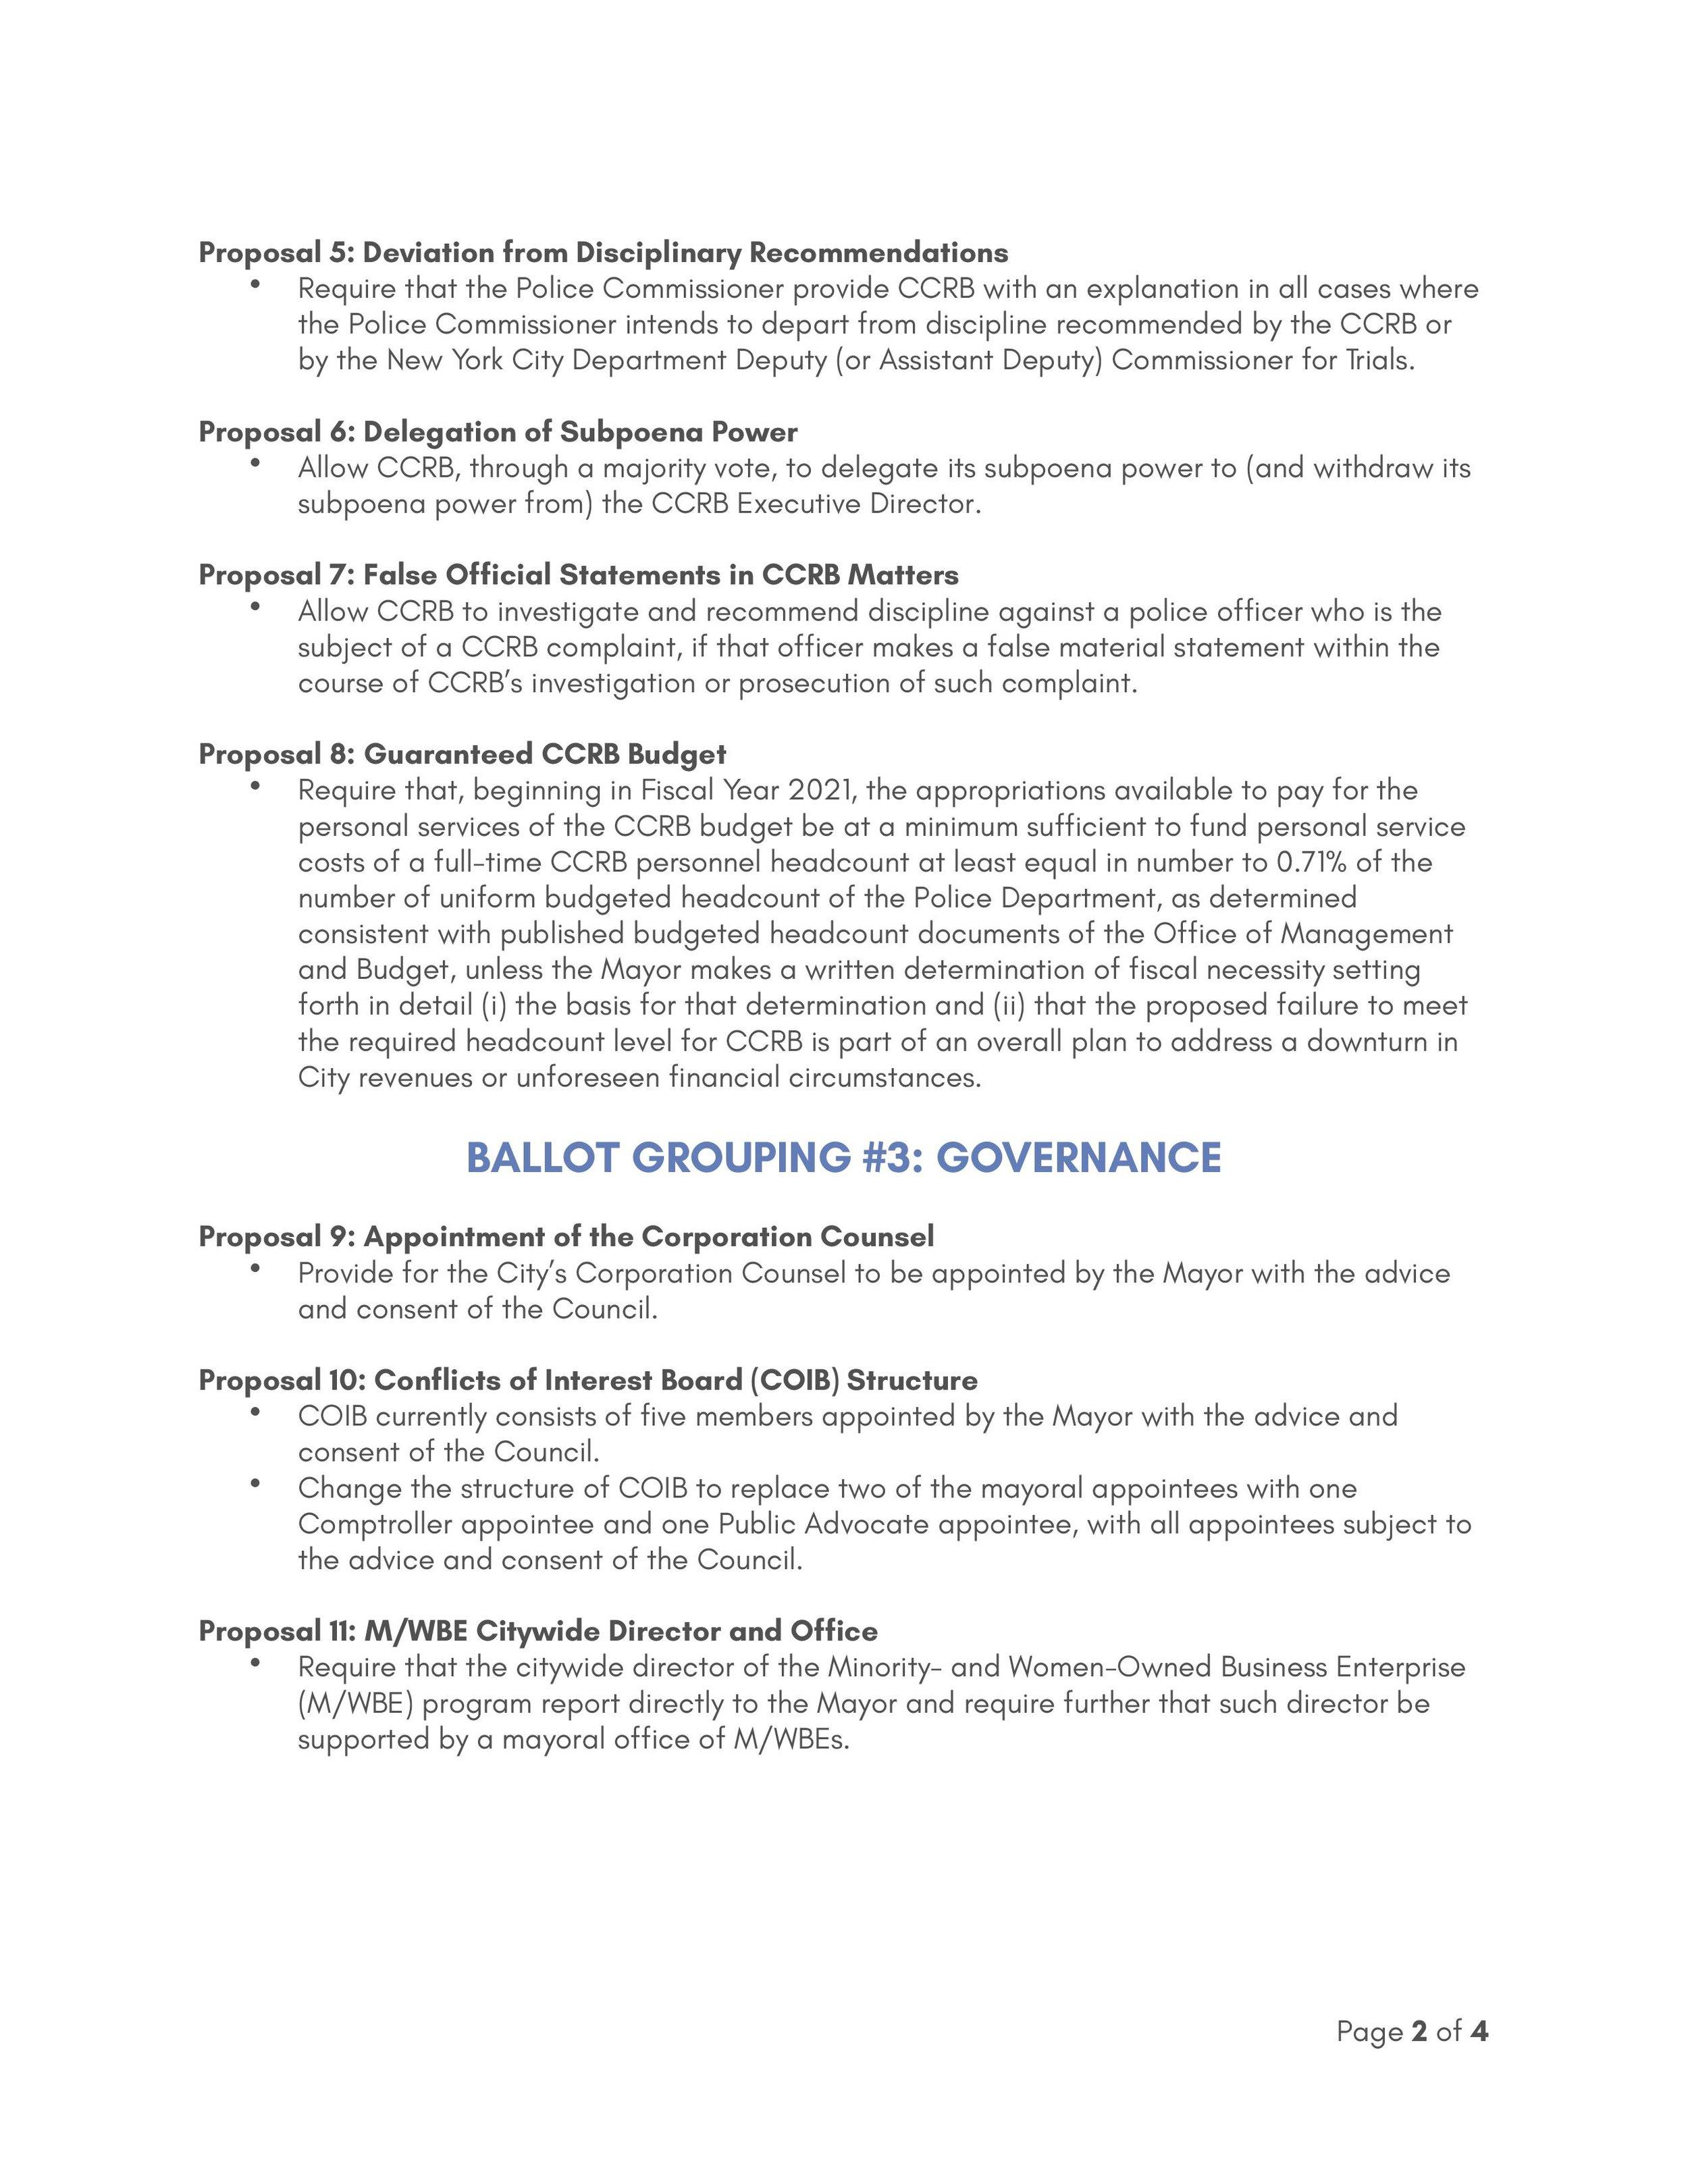 BallotProposals-page-002.jpg